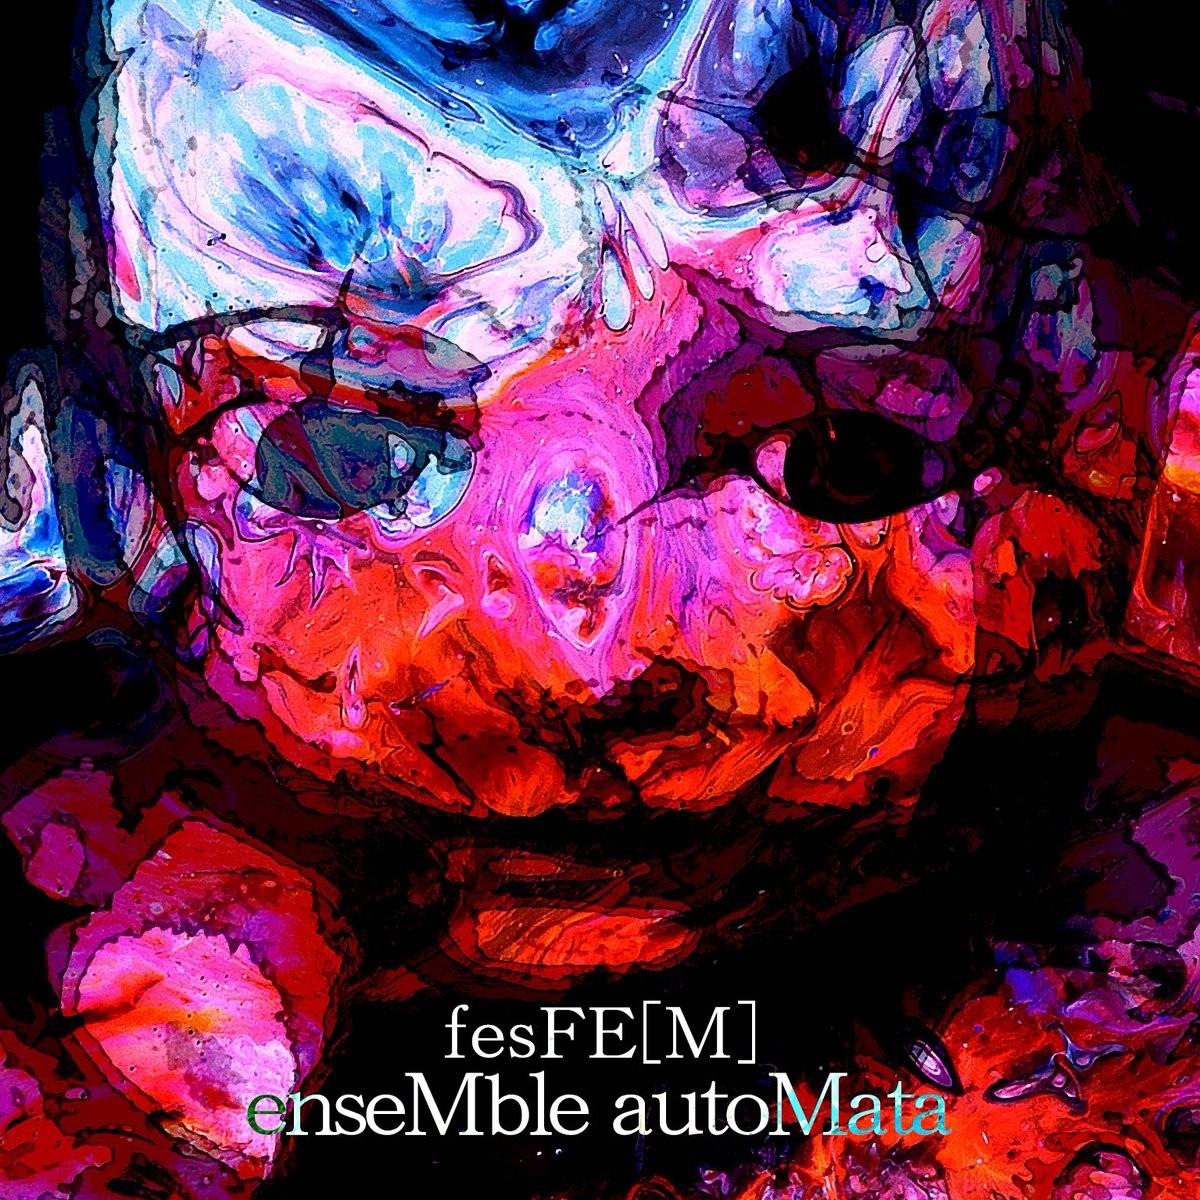 fesFE[M] – enseMble autoMata [FLAC + MP3 320 / CD] [2019.05.08]